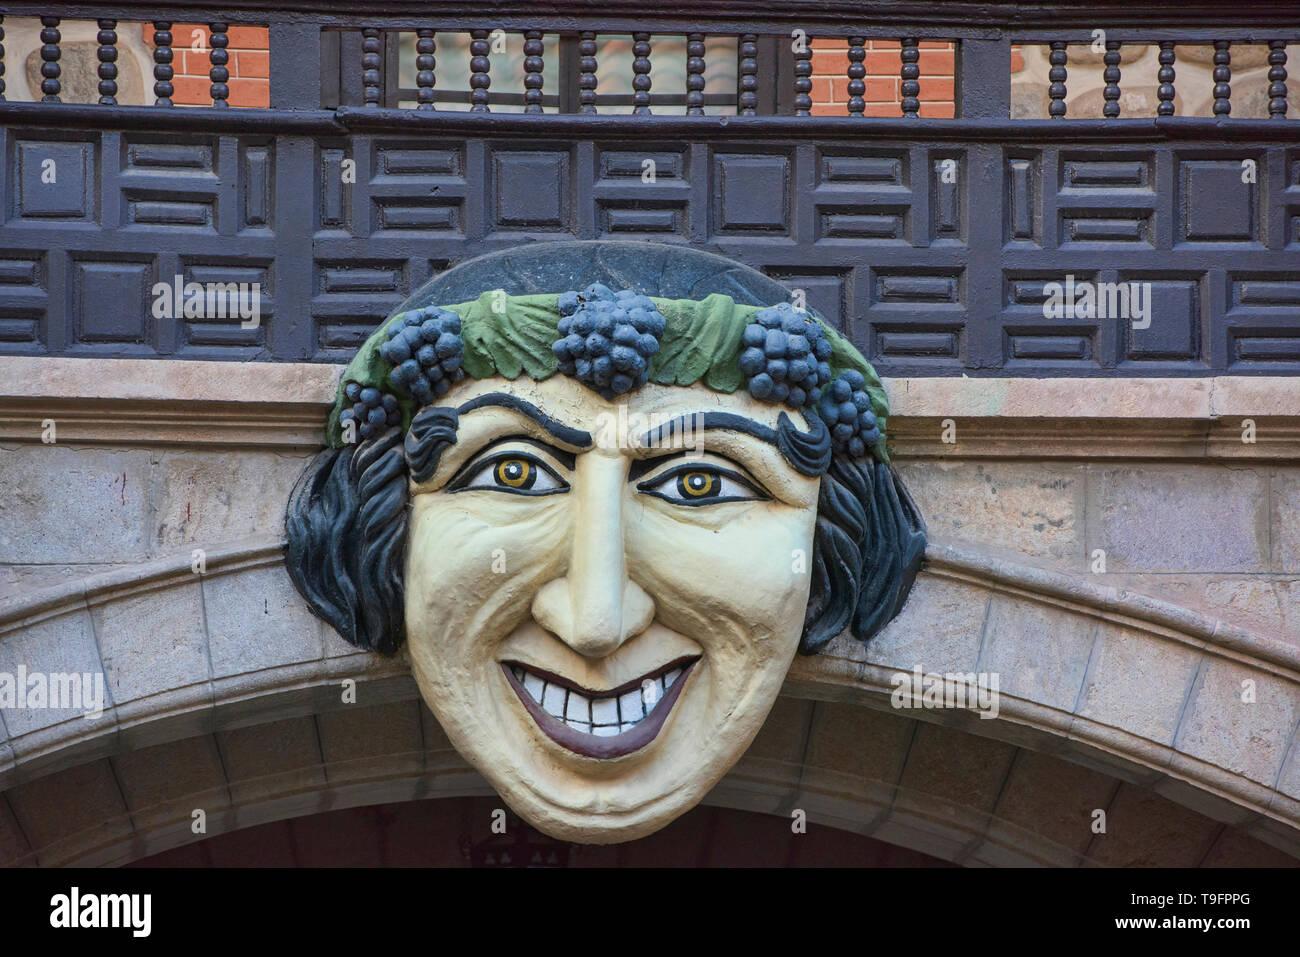 Bacchus mask in the courtyard of the Casa Nacional de la Moneda, Potosí, Bolivia - Stock Image